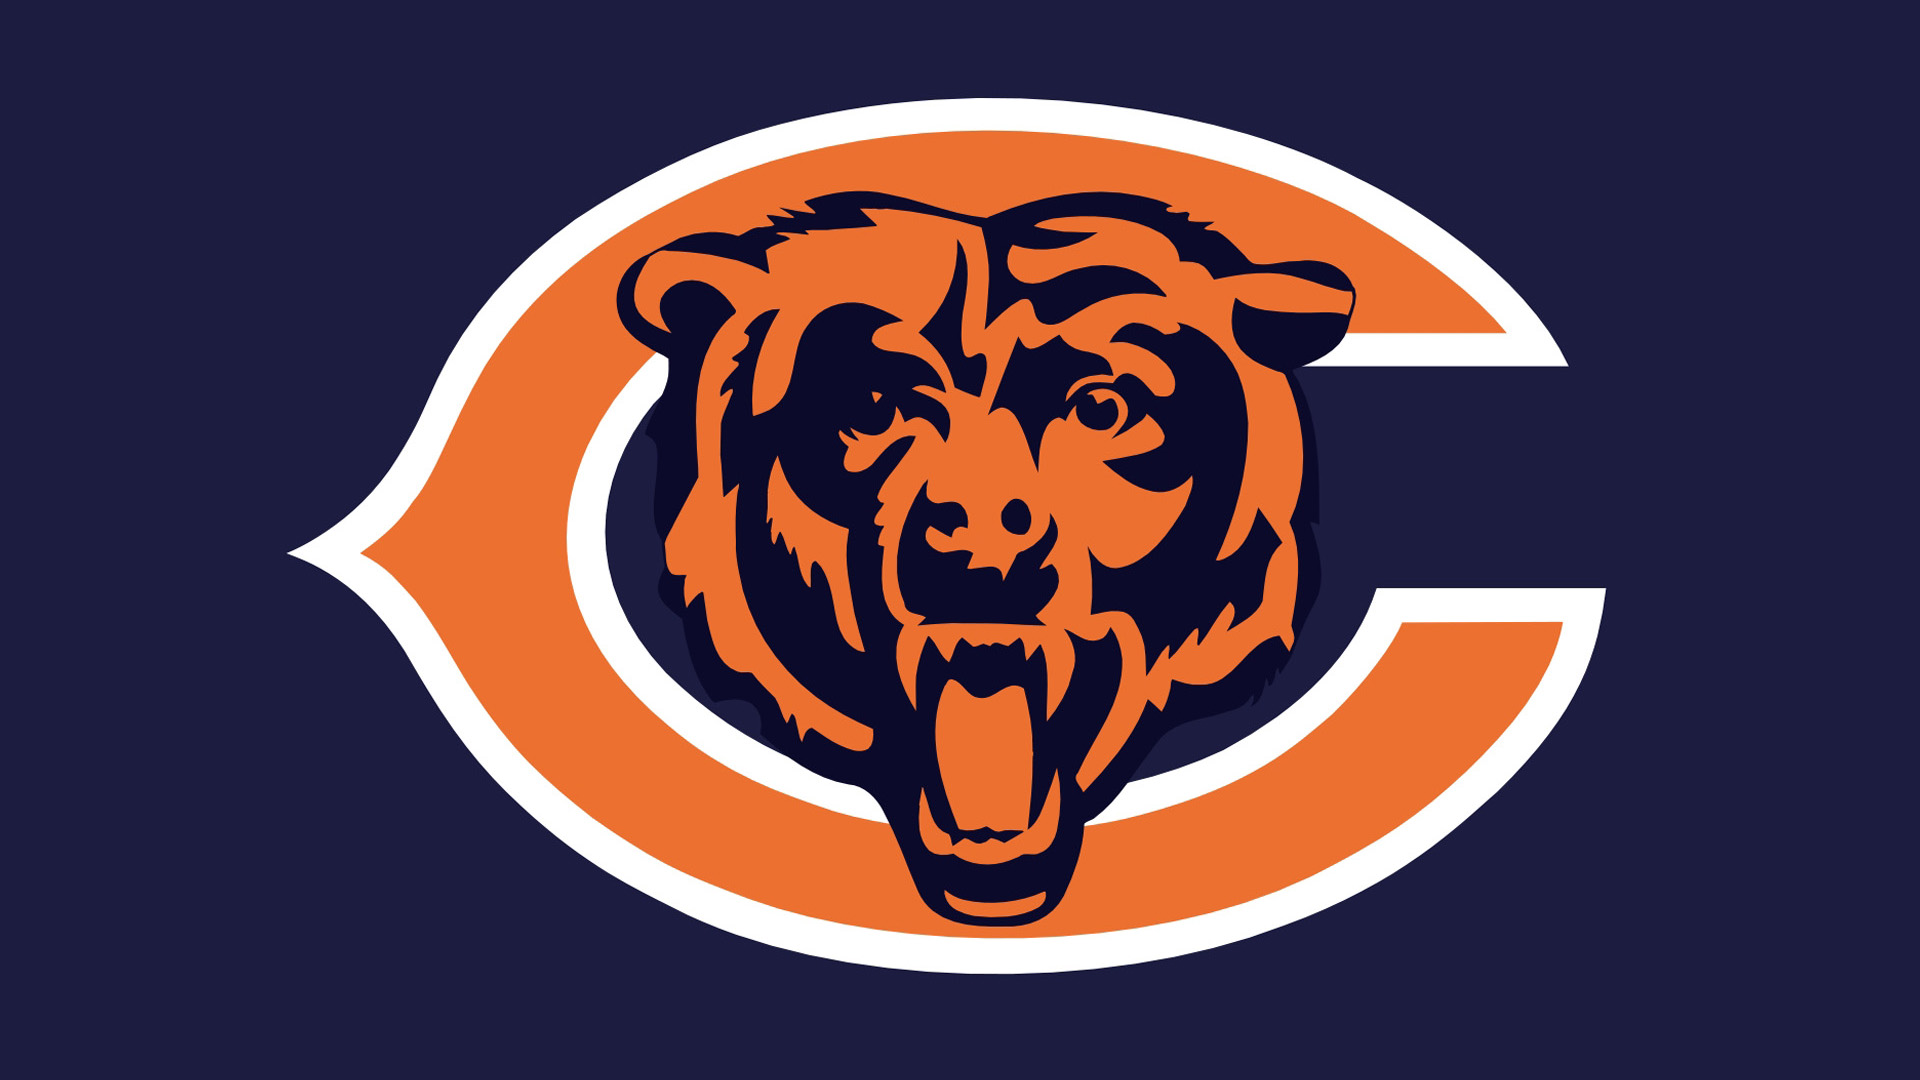 pixels wallpapers logos bears chicago 1920x1080 1920x1080